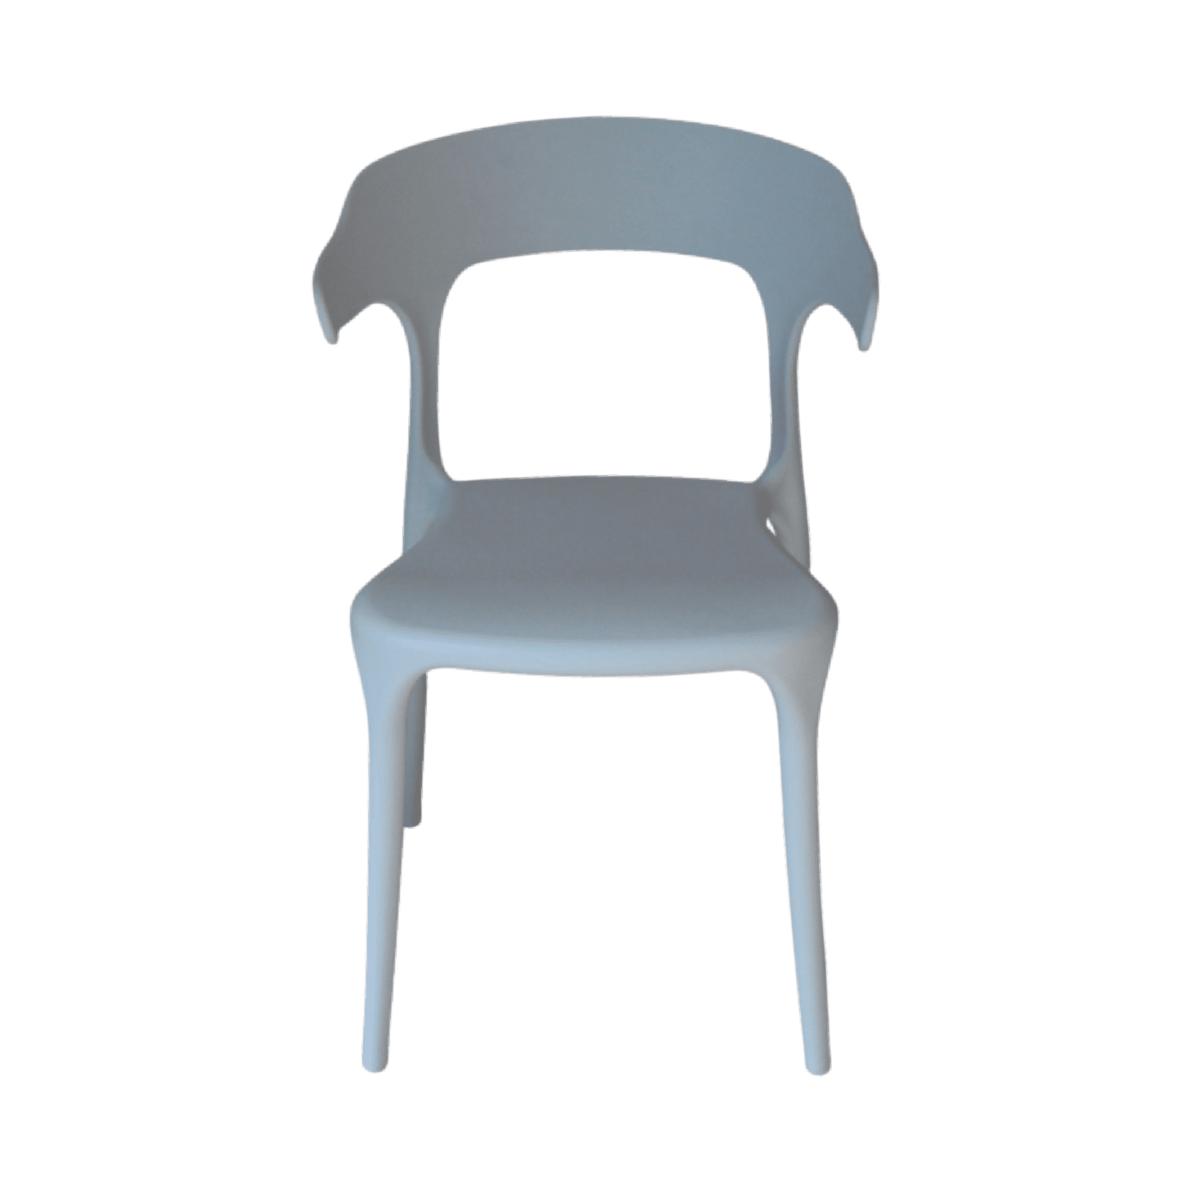 silla-arco-blanca